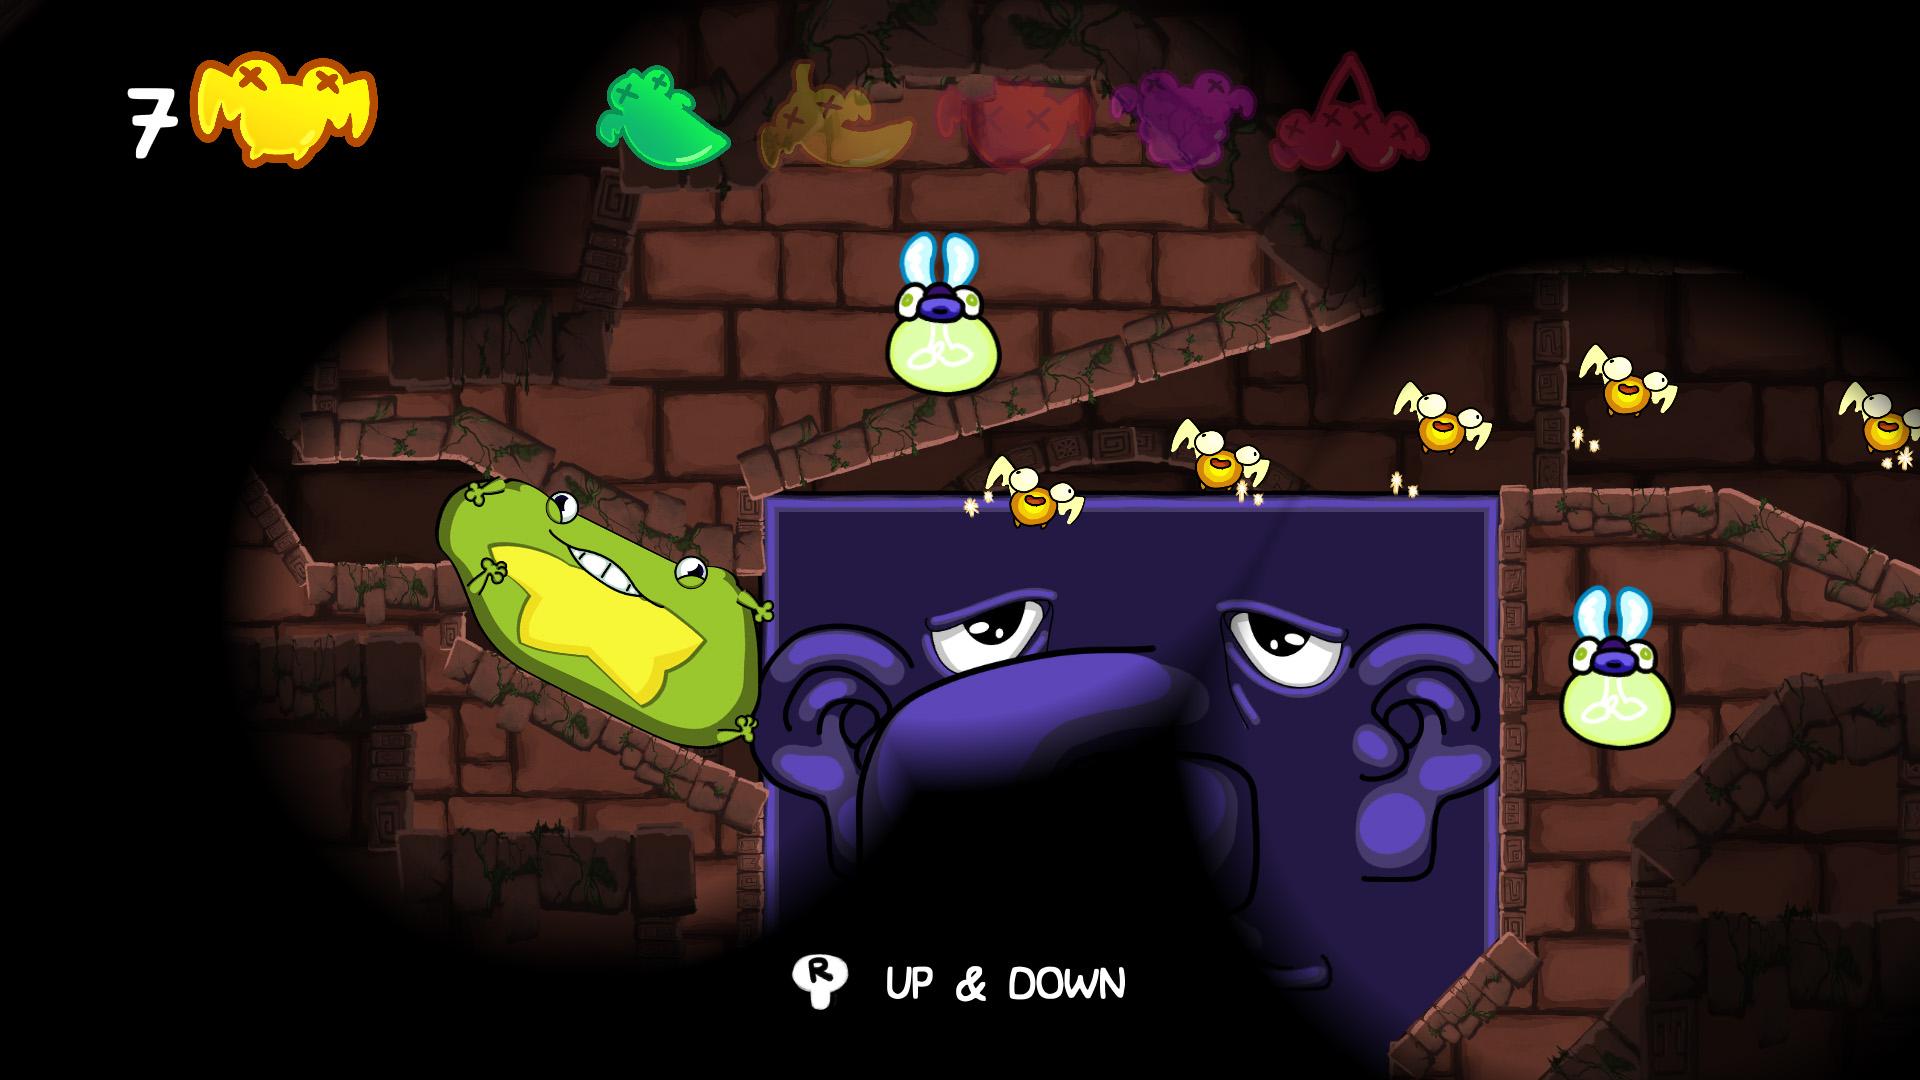 Pump the Frog screen_1920x1080_2018-11-22_11-40-27.jpg